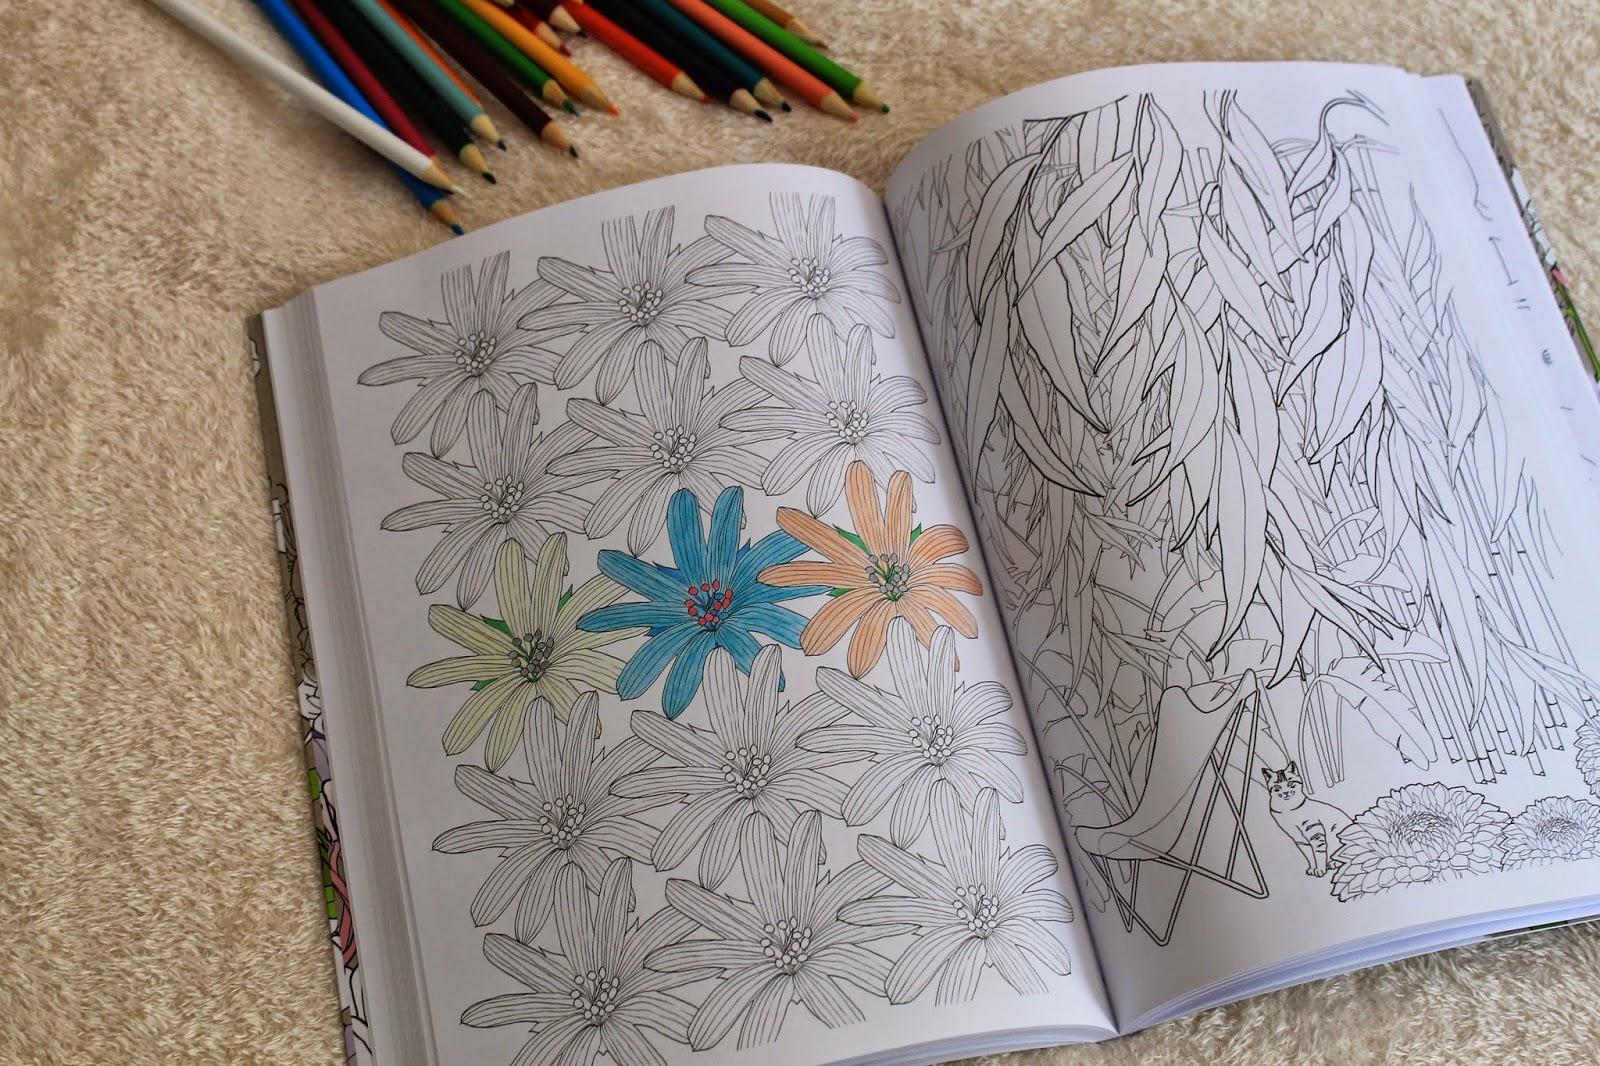 Estante da Nine: Jardim encantado: livro de colorir antiestresse de  #693D2D 1600x1066